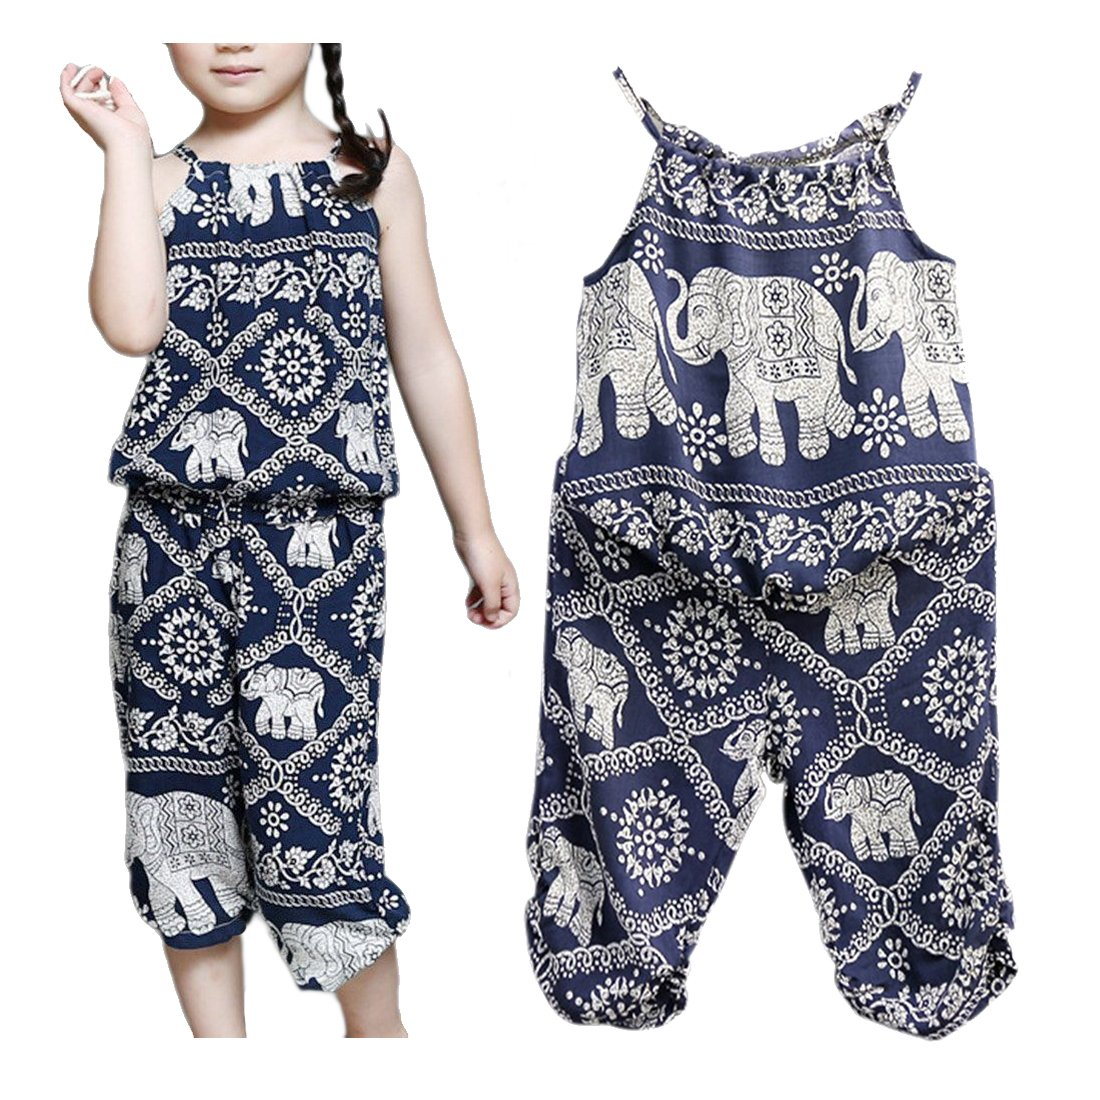 Ponce Fashion Baby Kid Girl Elephant Strap Vest with Floral Print Pant Jumpsuit 2Pcs Set